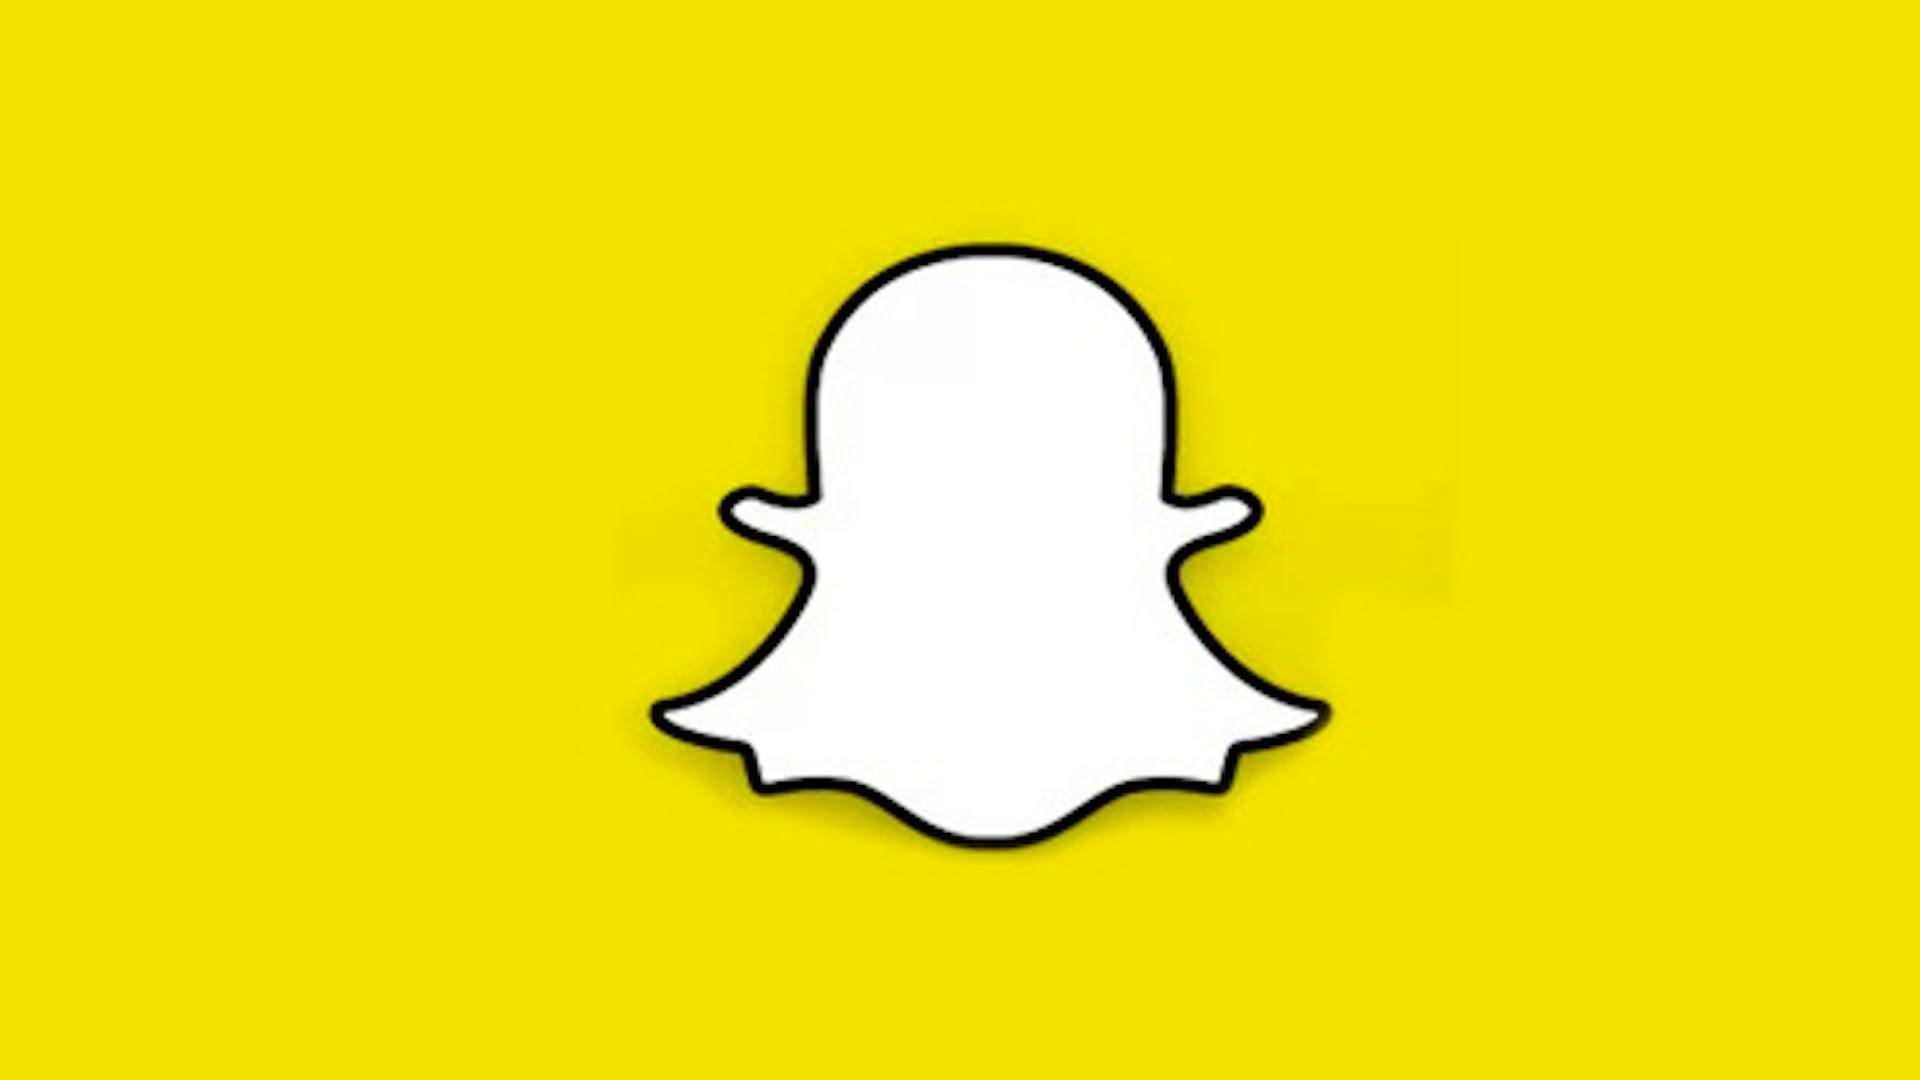 Best 45 Snapchat Backgrounds on HipWallpaper Snapchat Wallpaper 1920x1080